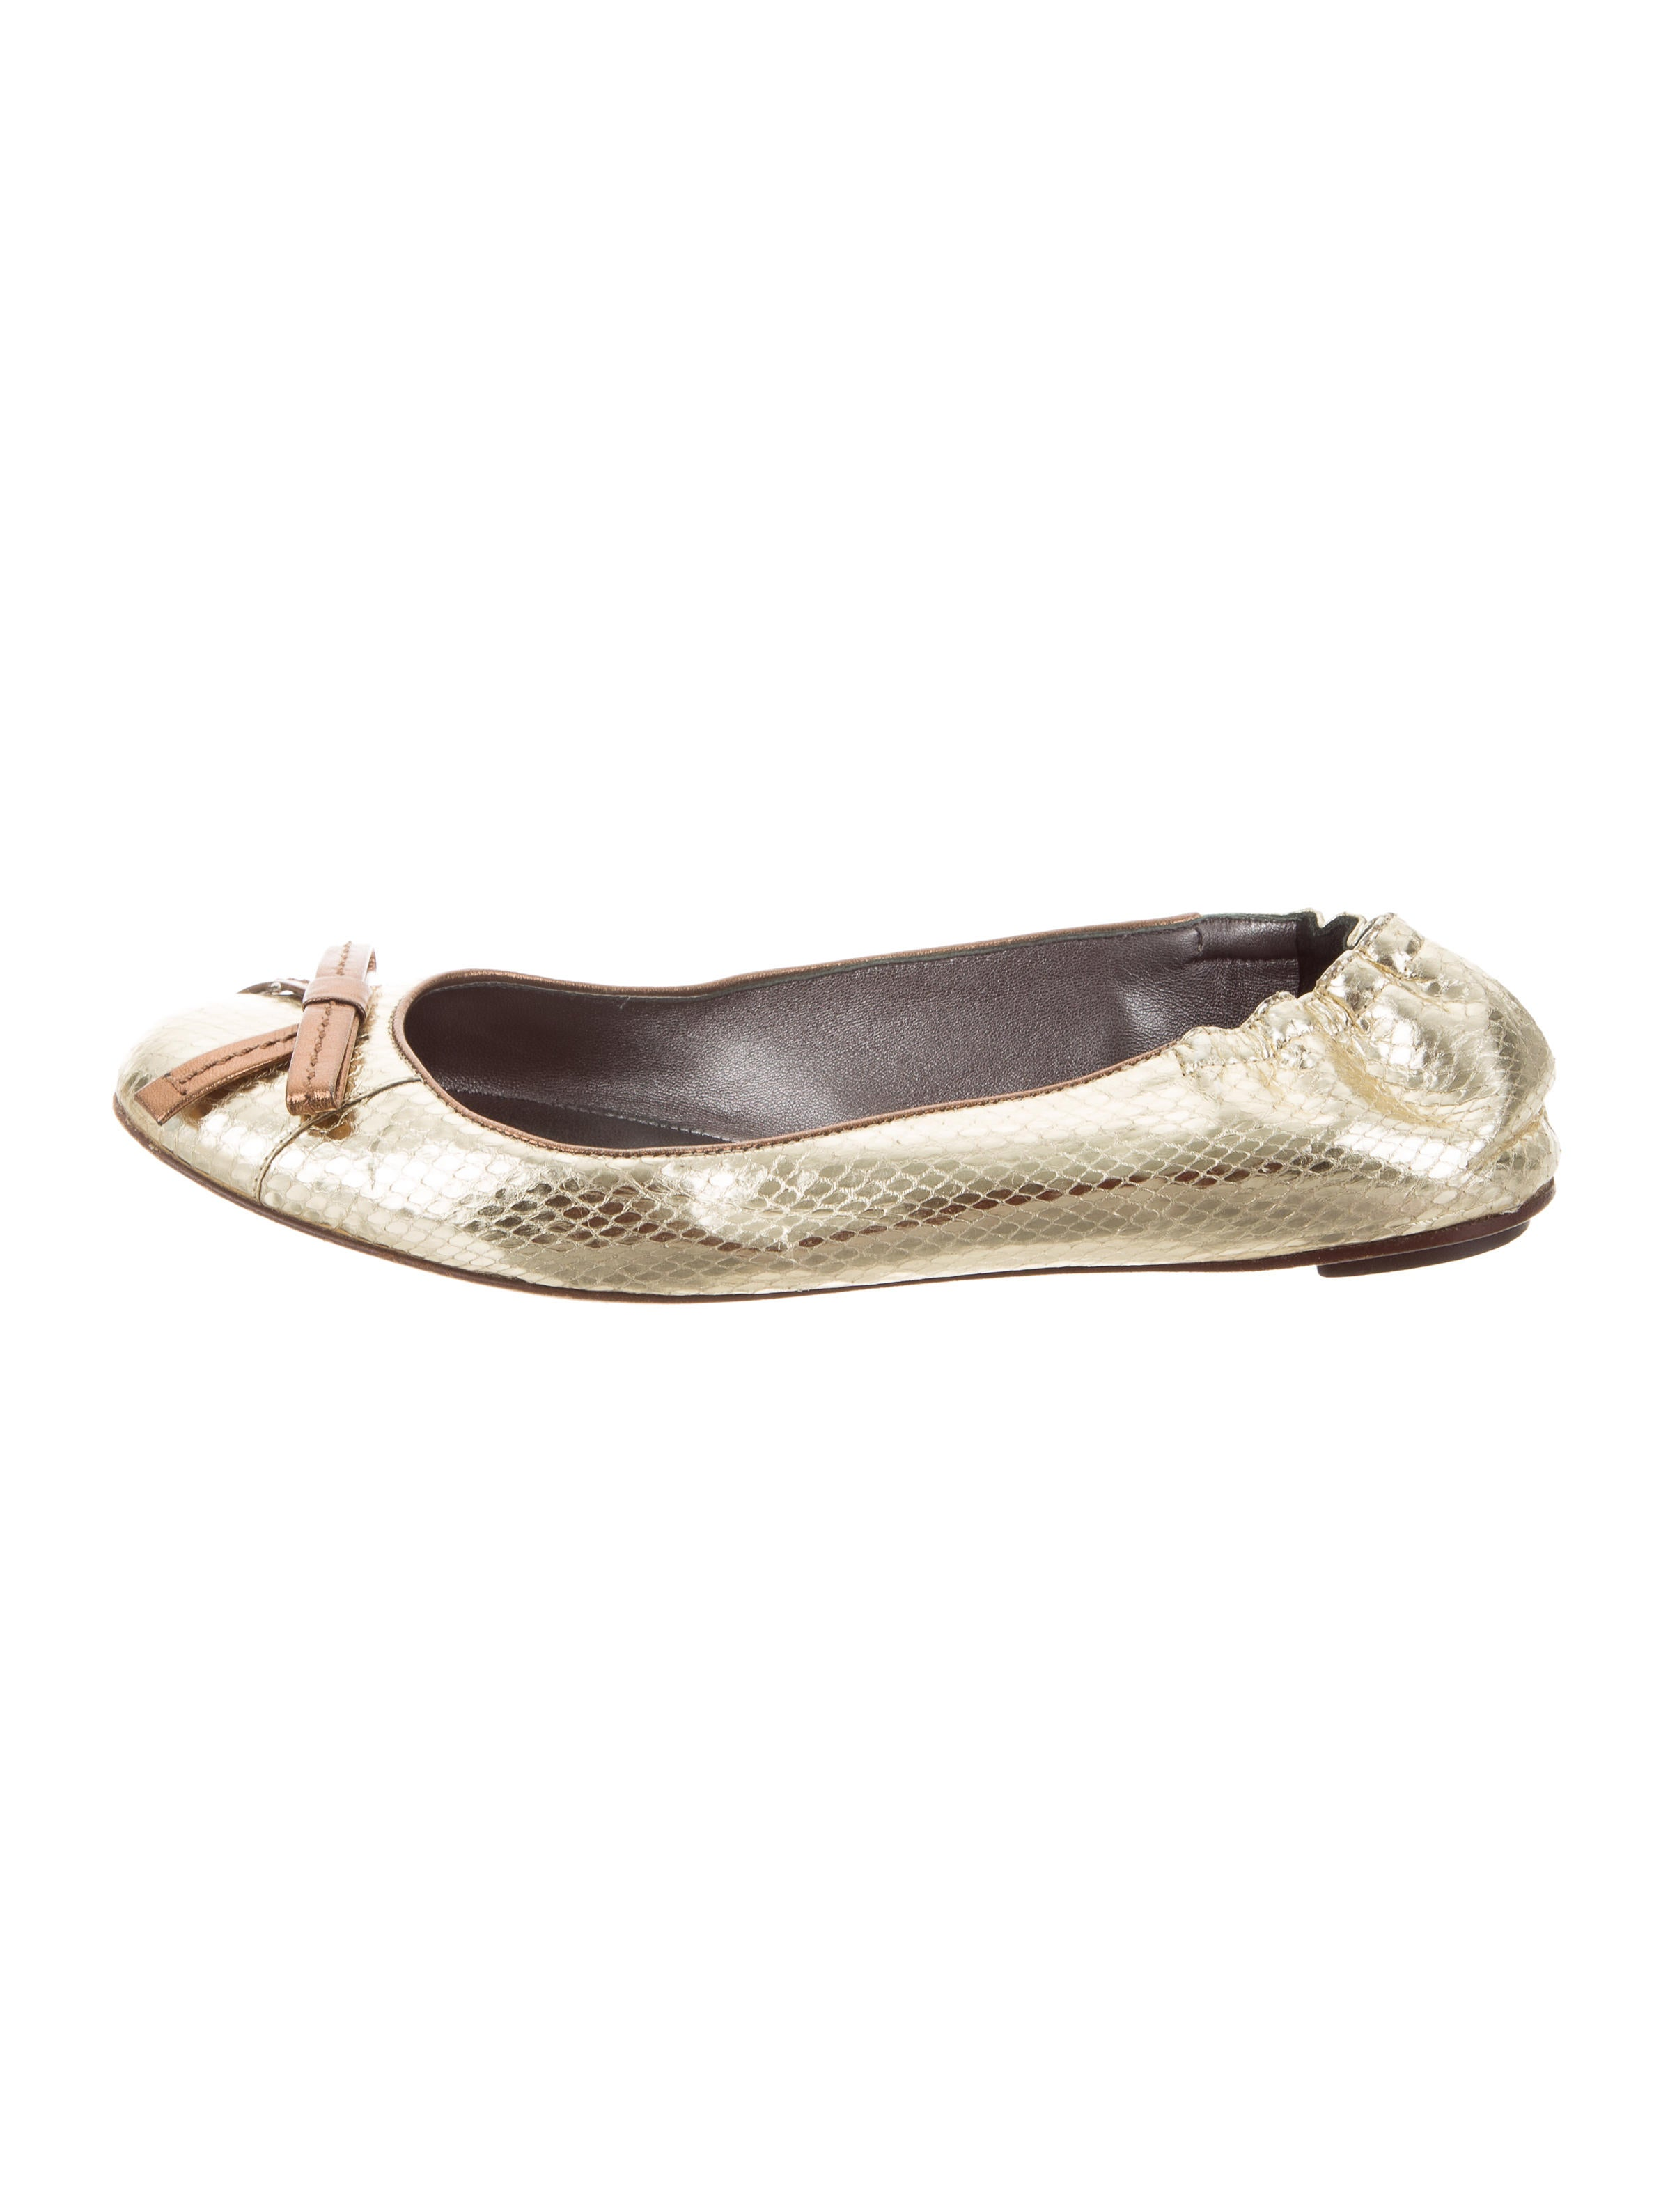 discount latest discount release dates Dolce & Gabbana Metallic Snakeskin Flats 100% original cheap price UU8eRDiku3